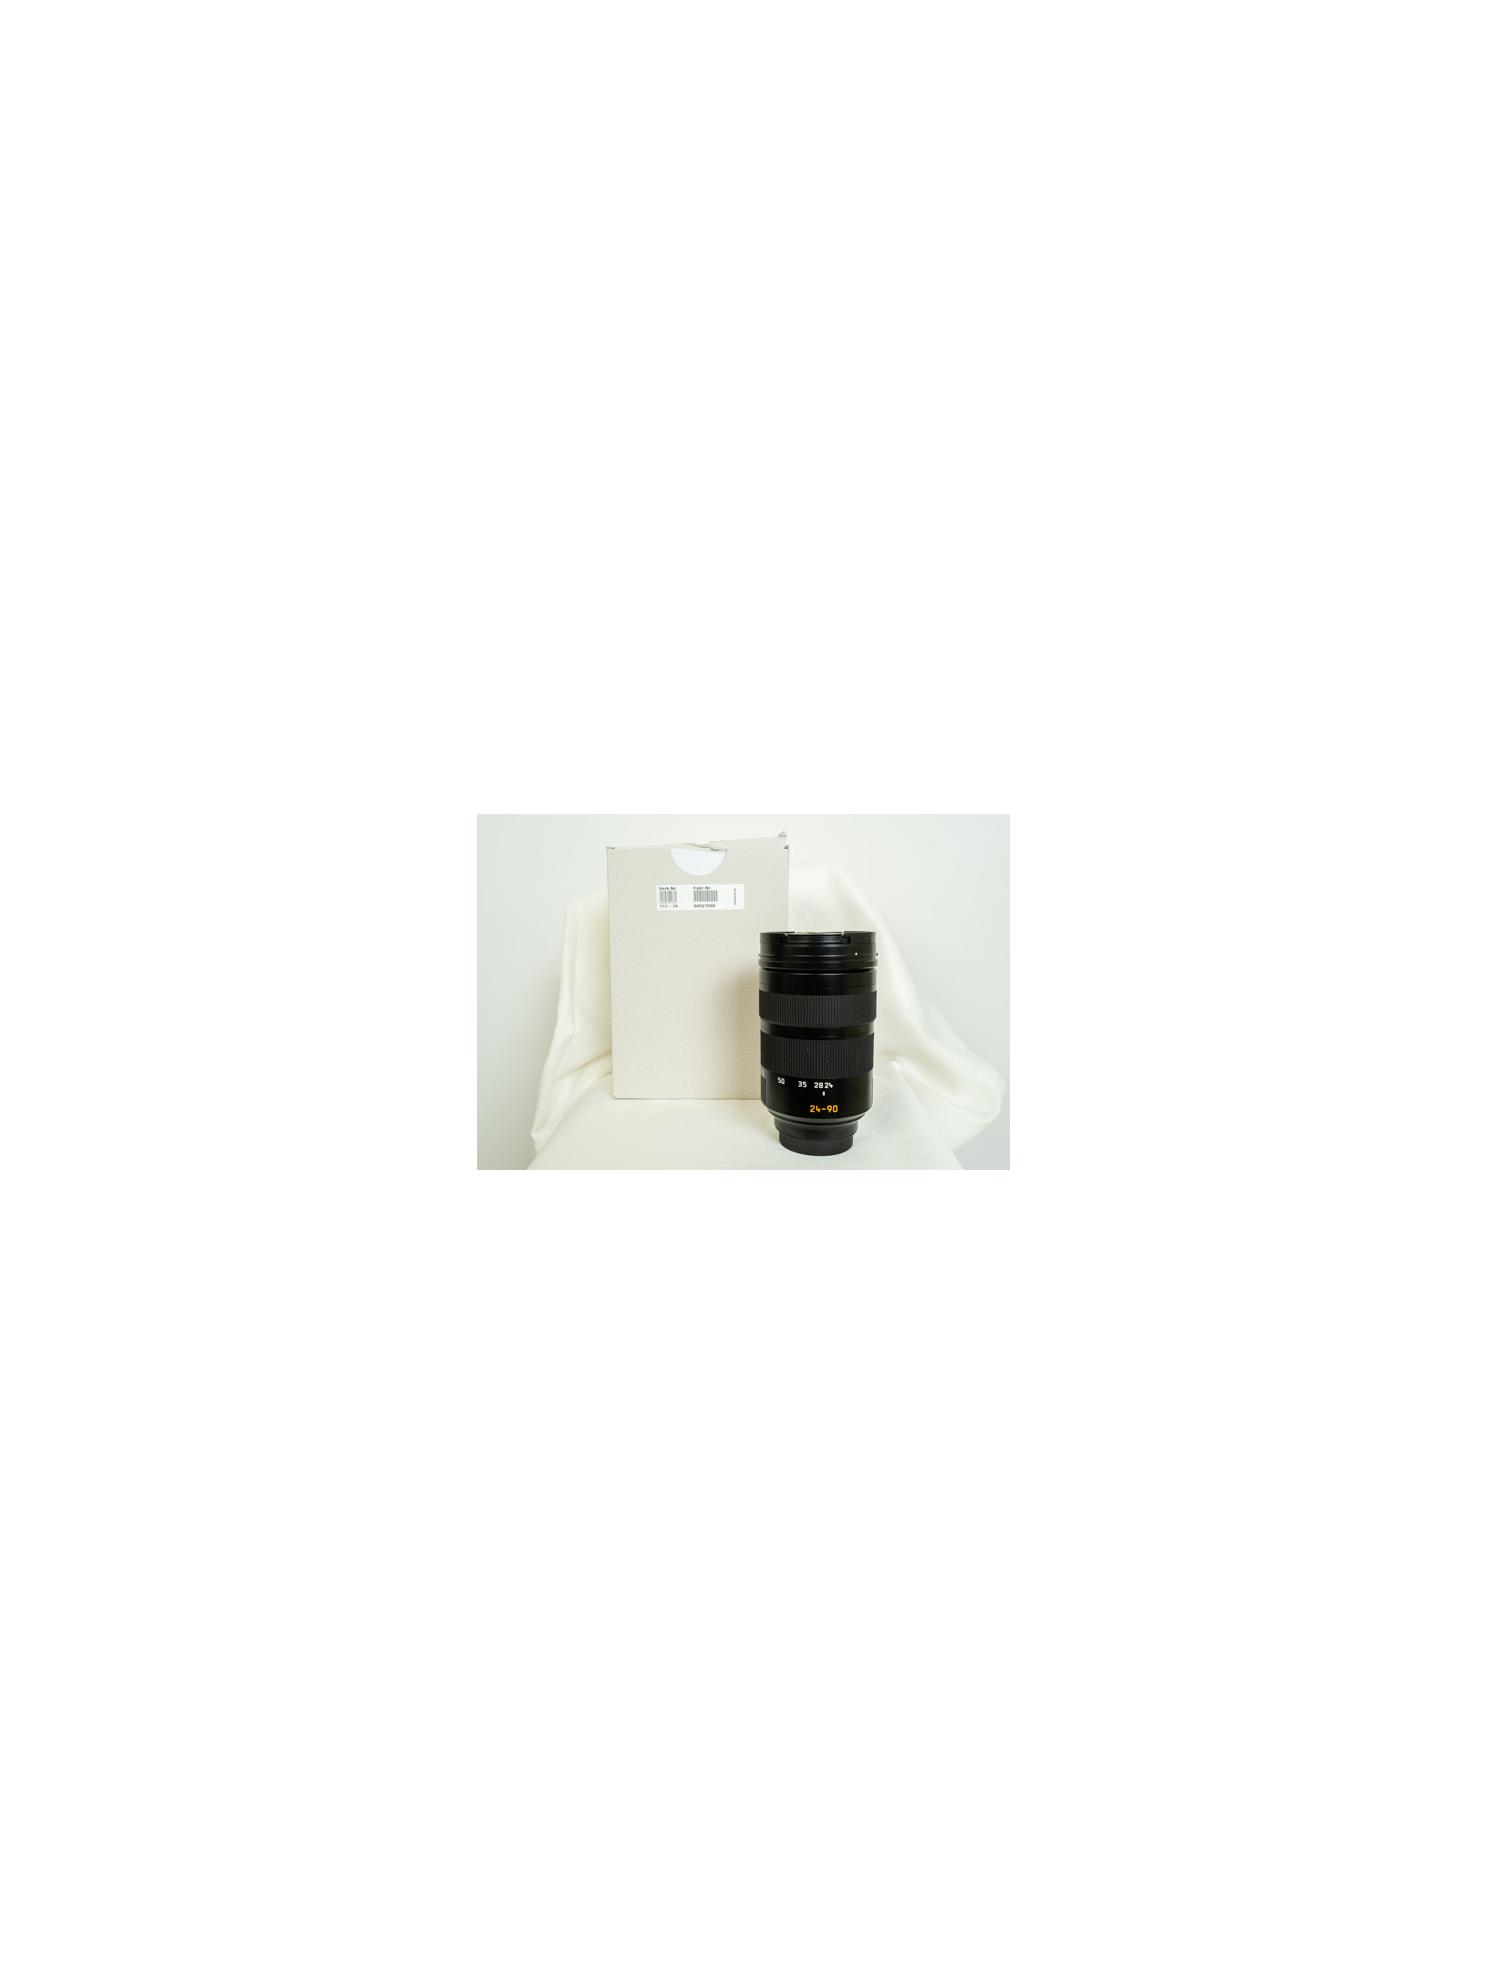 Leica Vario-Elmarit SL 24-90/f2